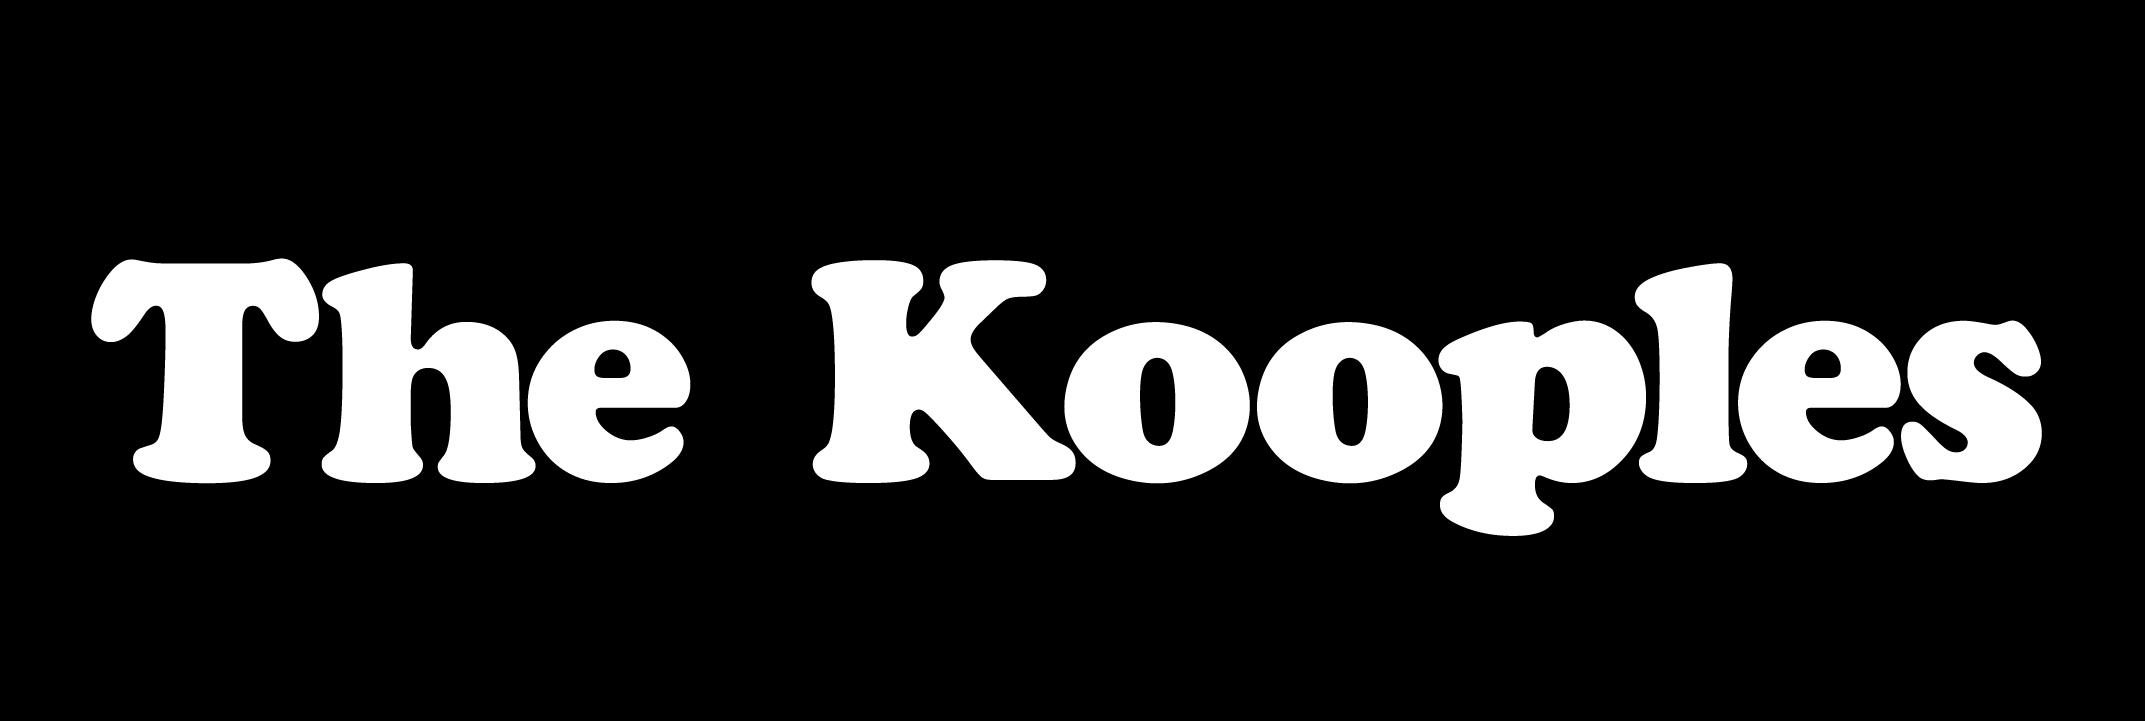 https://media.fulltip.com/affiliates/The+Kooples/Logo_The_Kooples.png